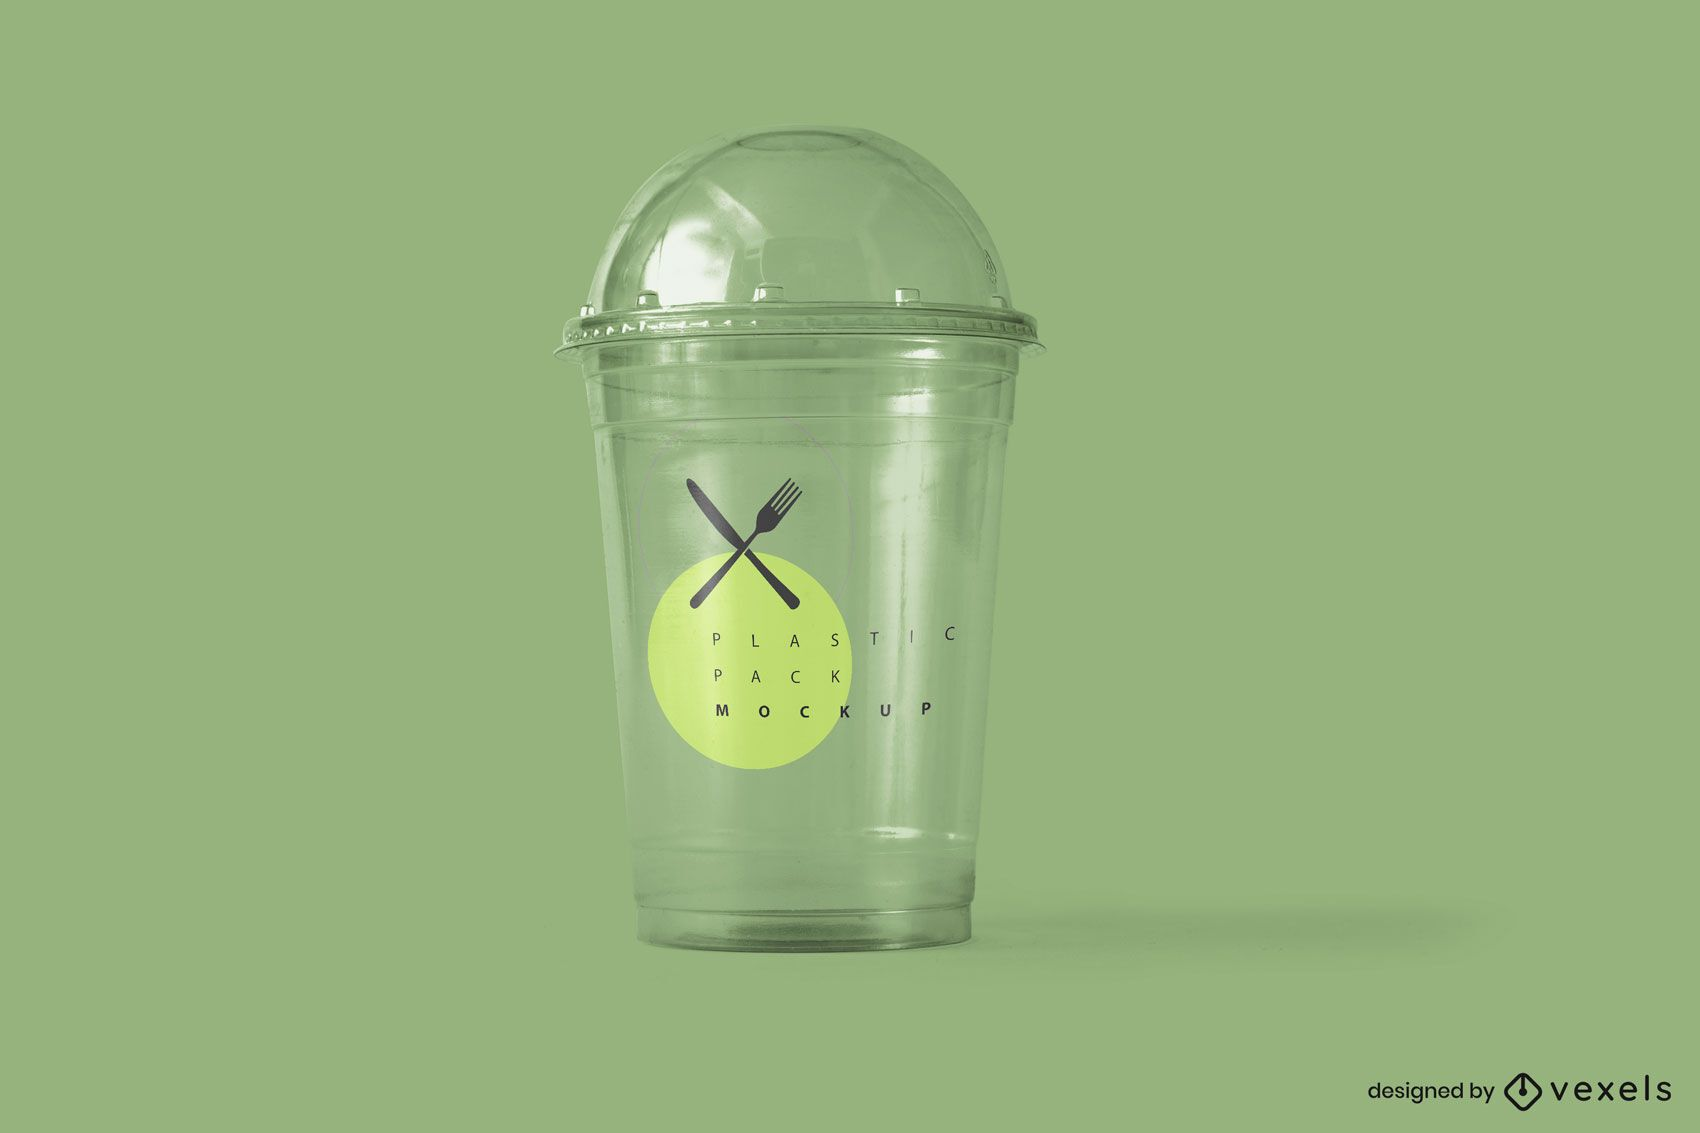 Plastic cup packaging mockup design